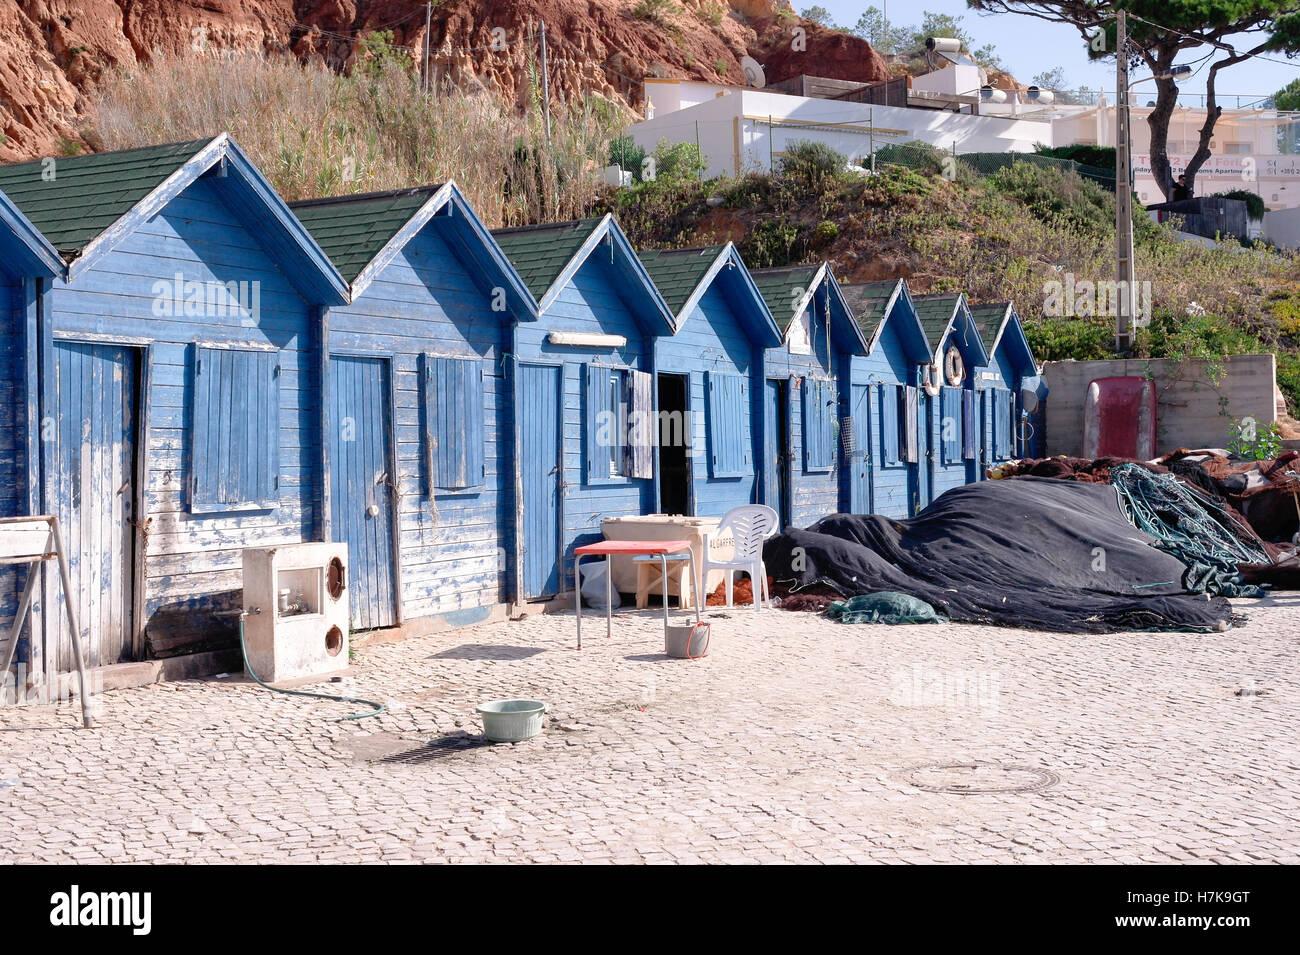 Fisherman's huts on beach near Albufiera in Portugal Stock Photo